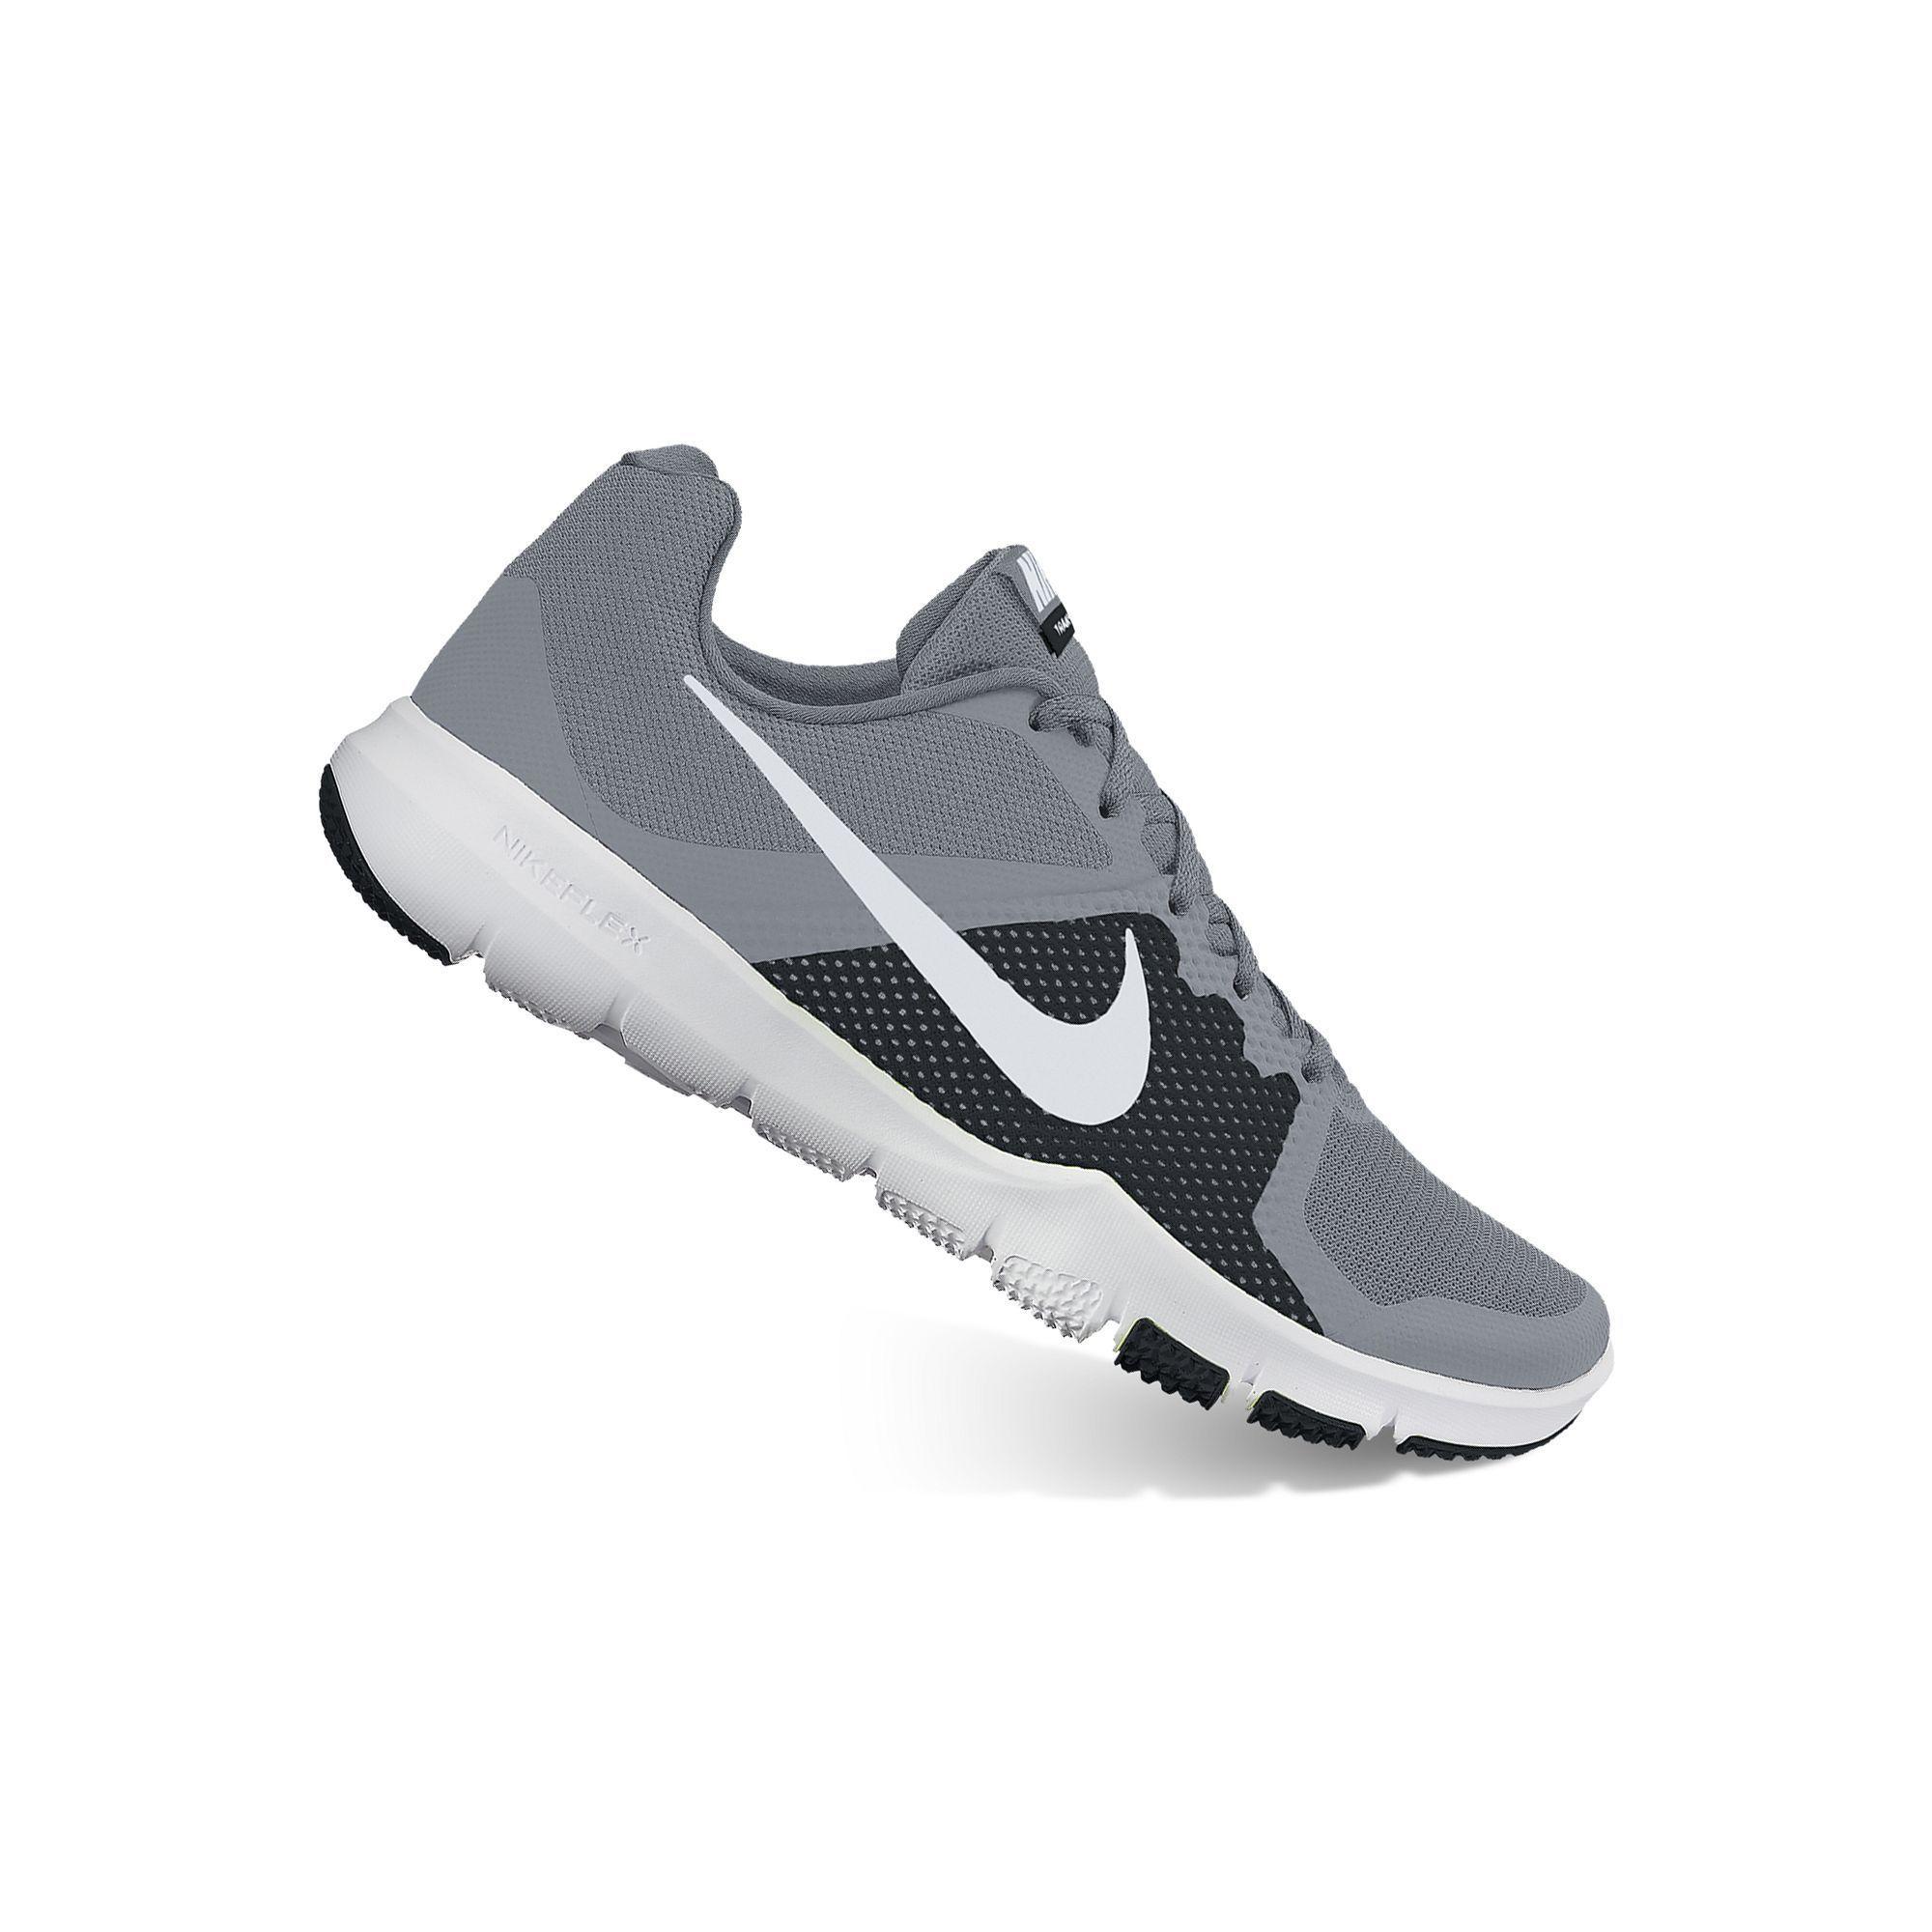 70bb7750a1c0d Nike Flex Control Men s Cross-Training Shoes